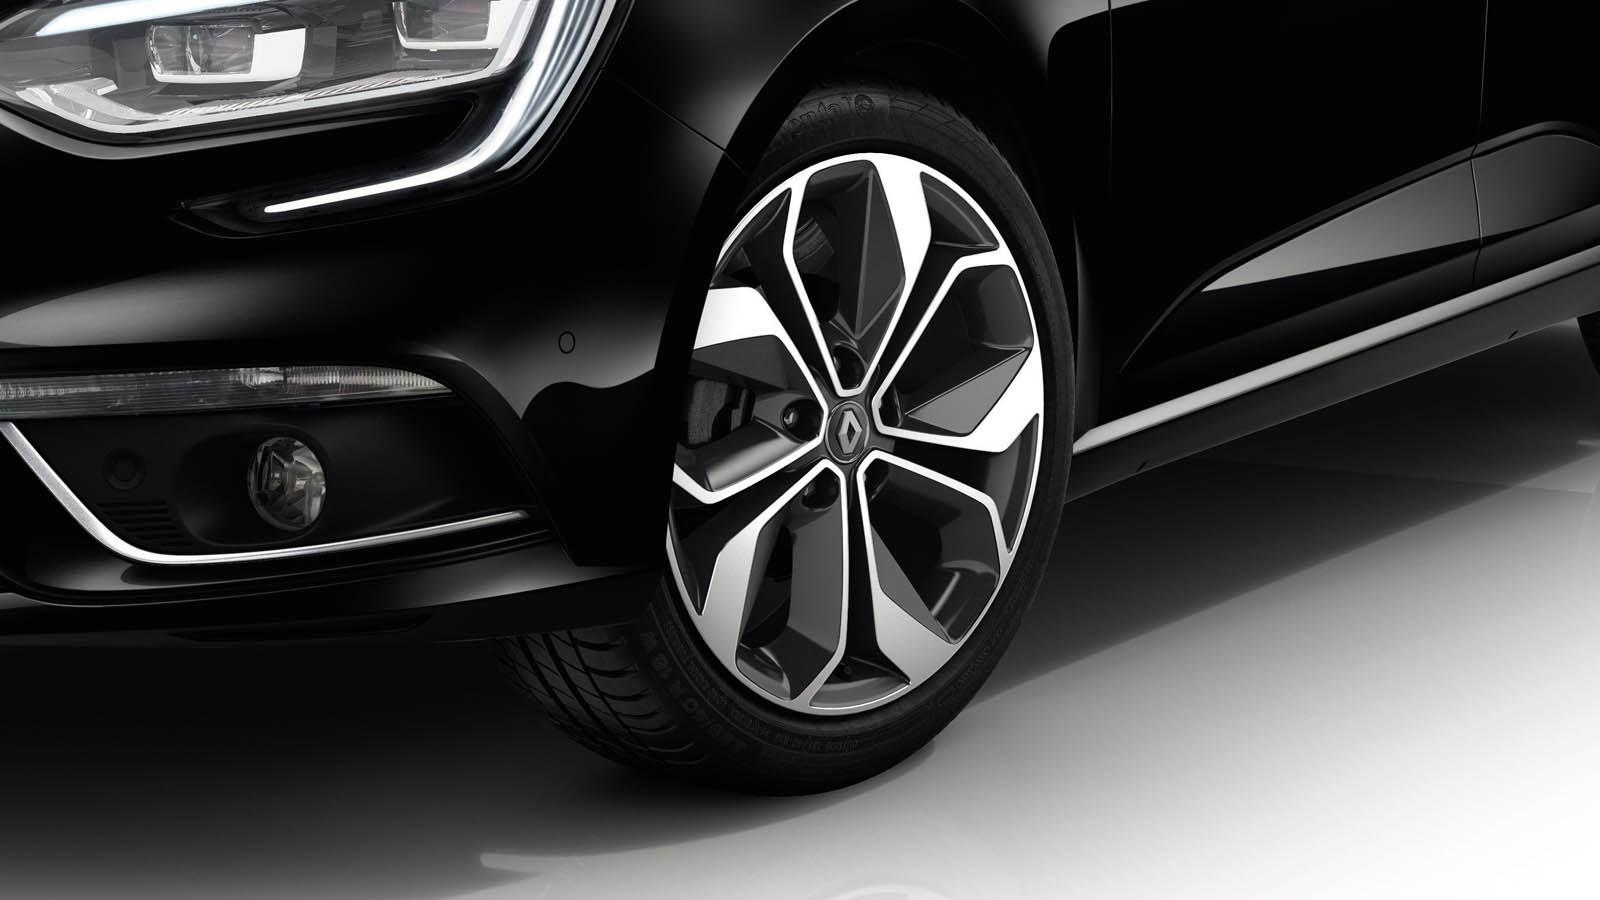 Renault Megane Akaju Edition (2)